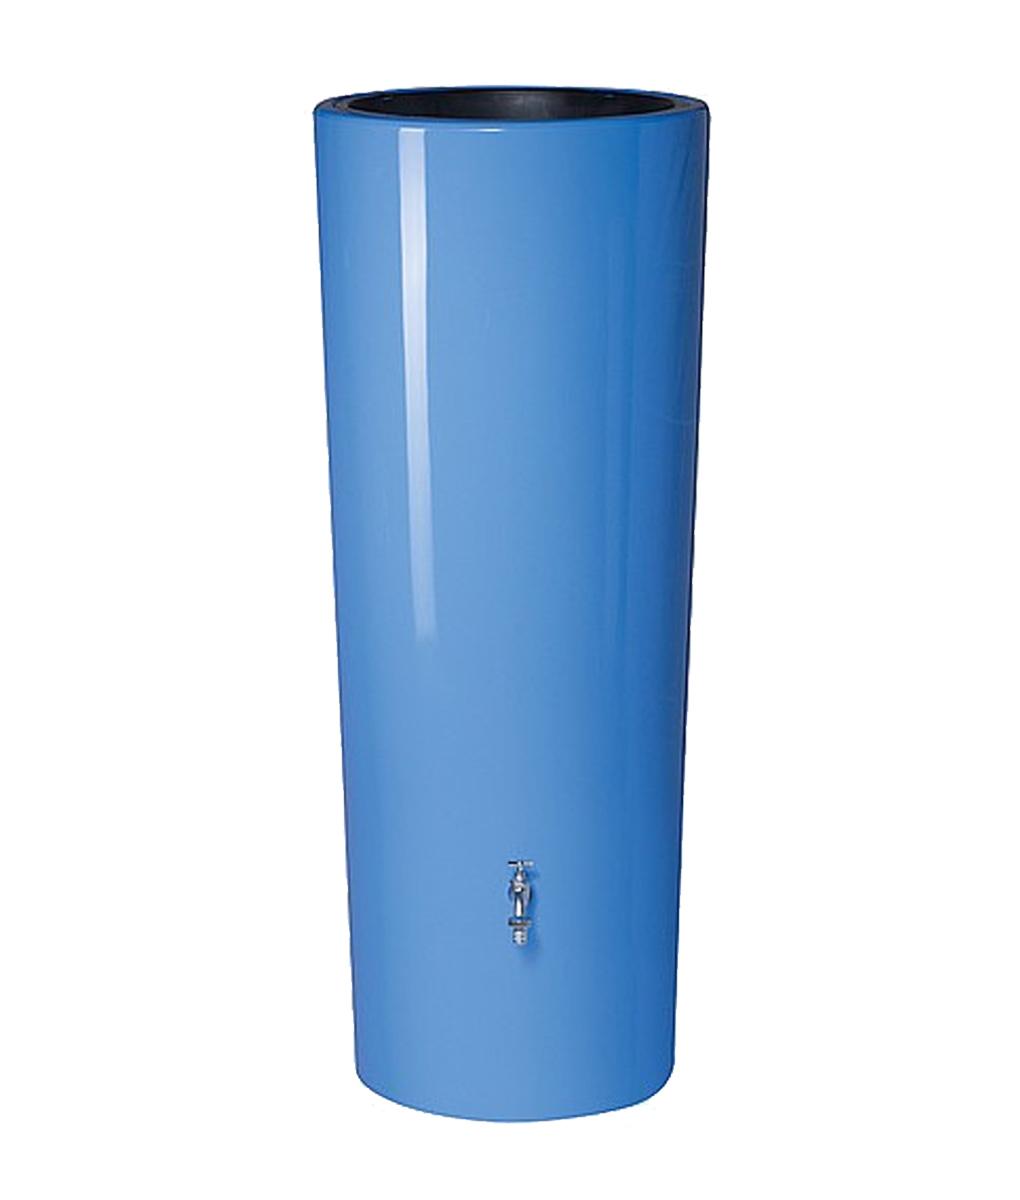 Blue 2 in 1 Water Butt Tank 350 Litre - Aqualogic AWDirect